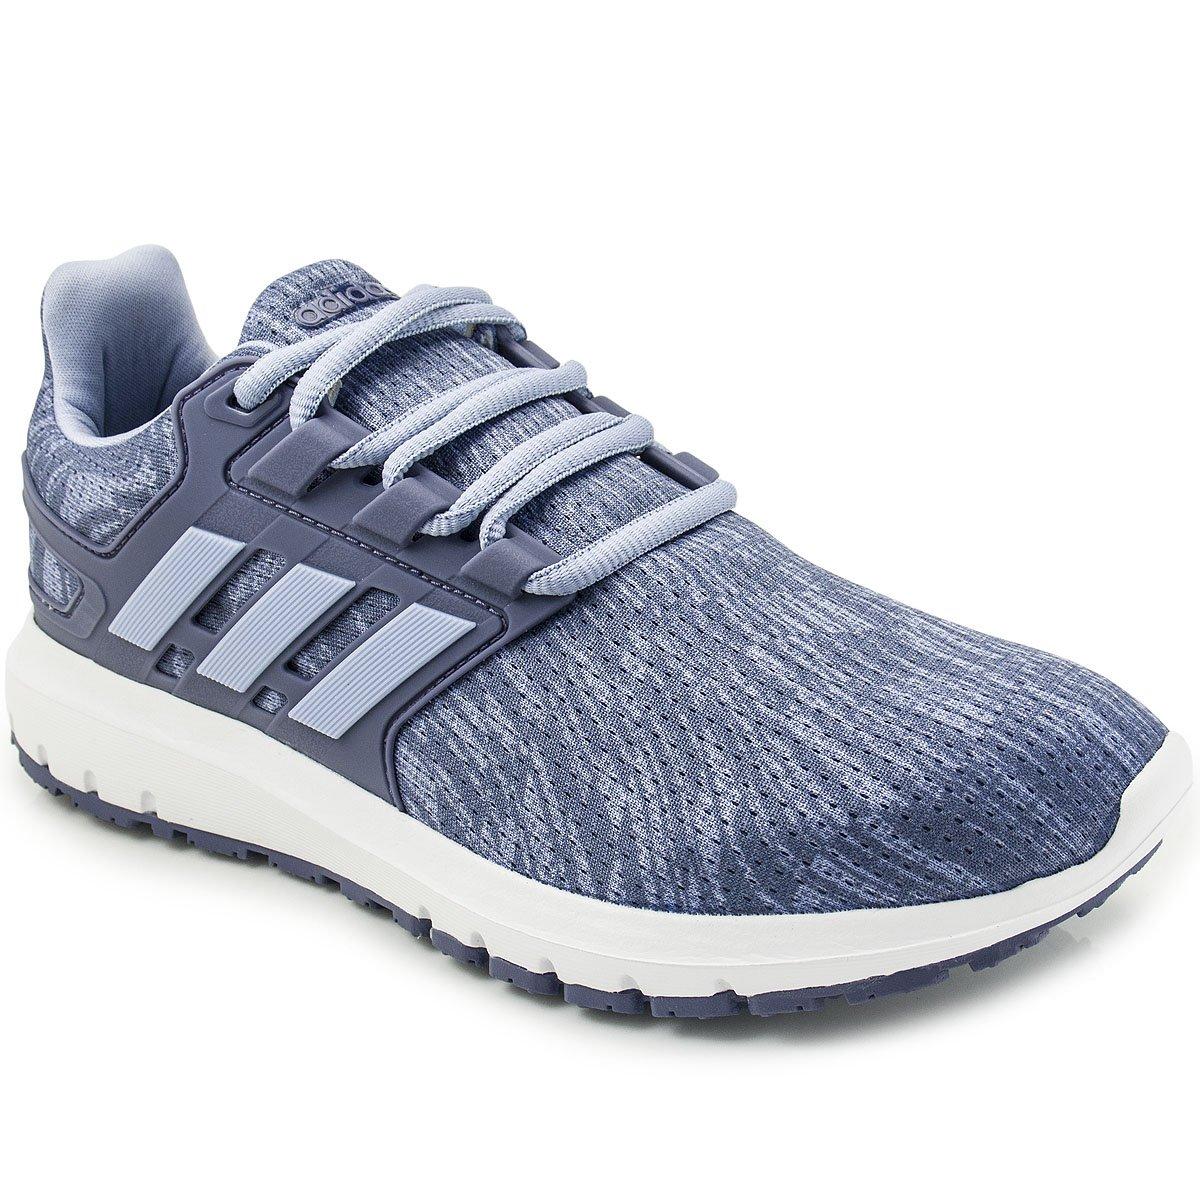 c4371a2c1 Tênis Adidas Energy Cloud 2 Feminino